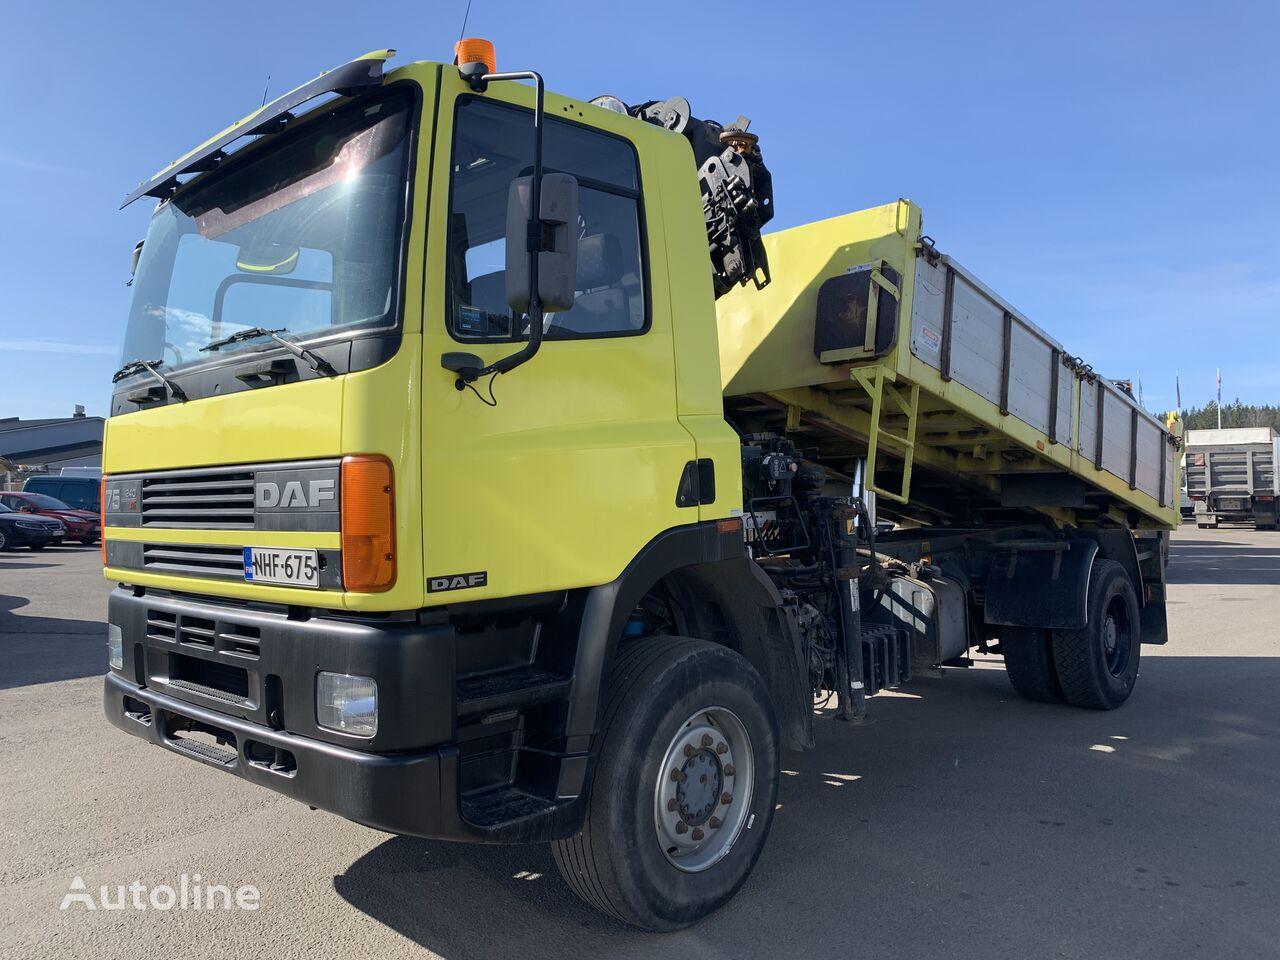 DAF CF75 4x4 tipper with hiab 160 radio like new original km dump truck